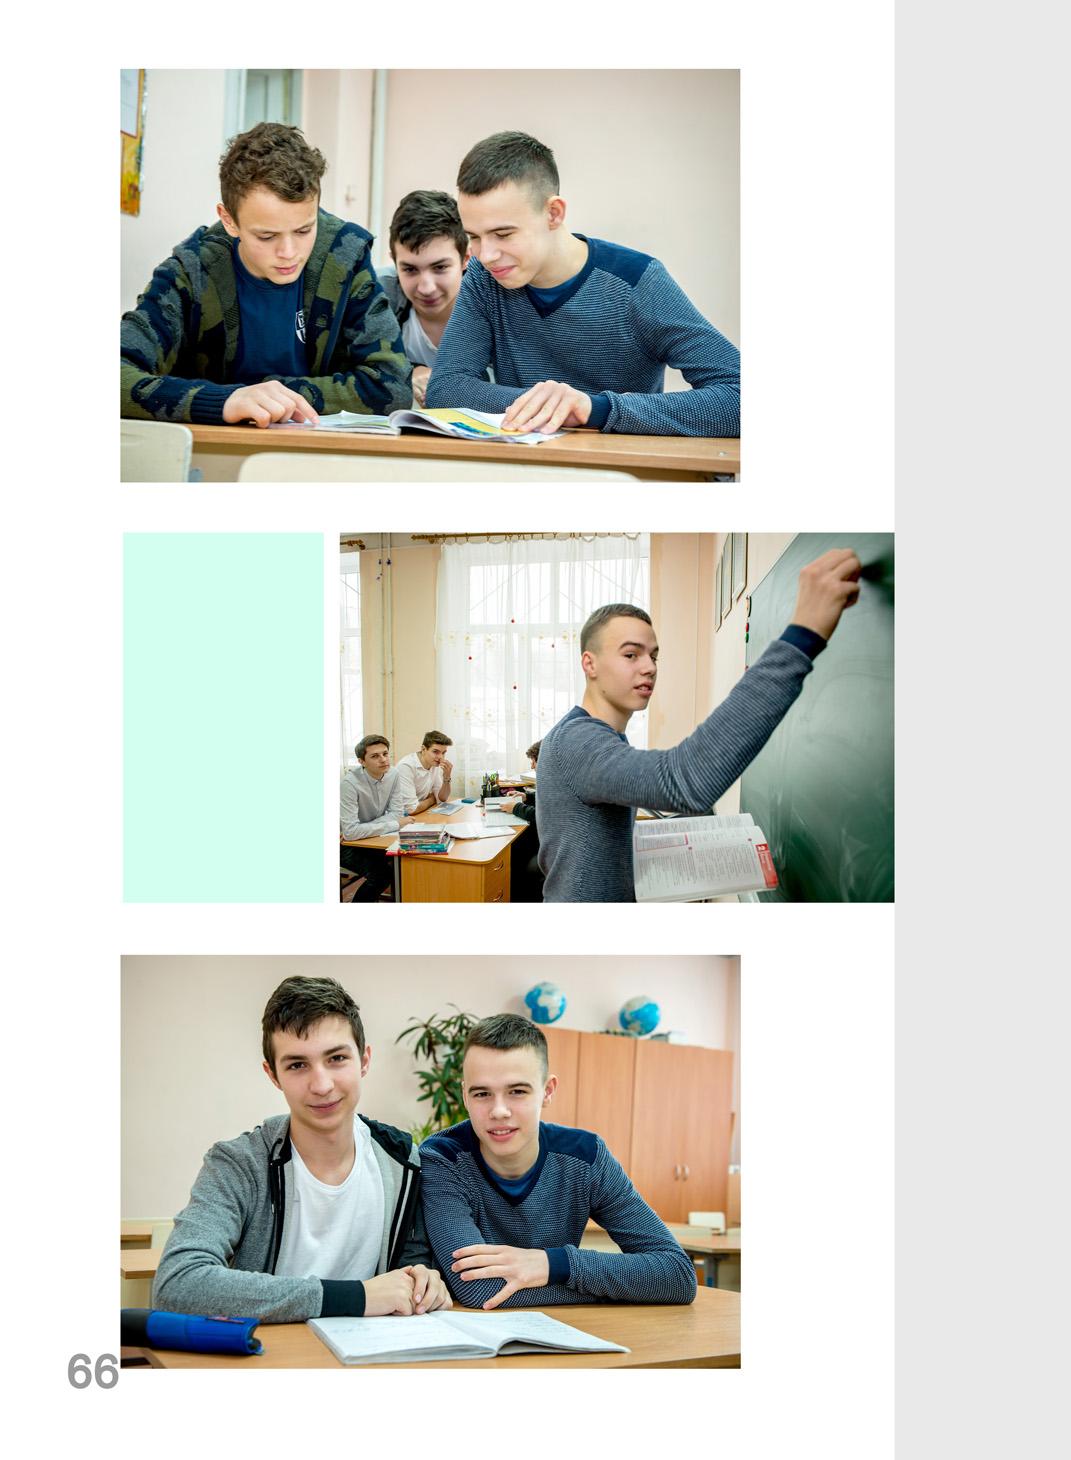 https://school-photo.com.ua/wp-content/uploads/2019/09/68-copy.jpg